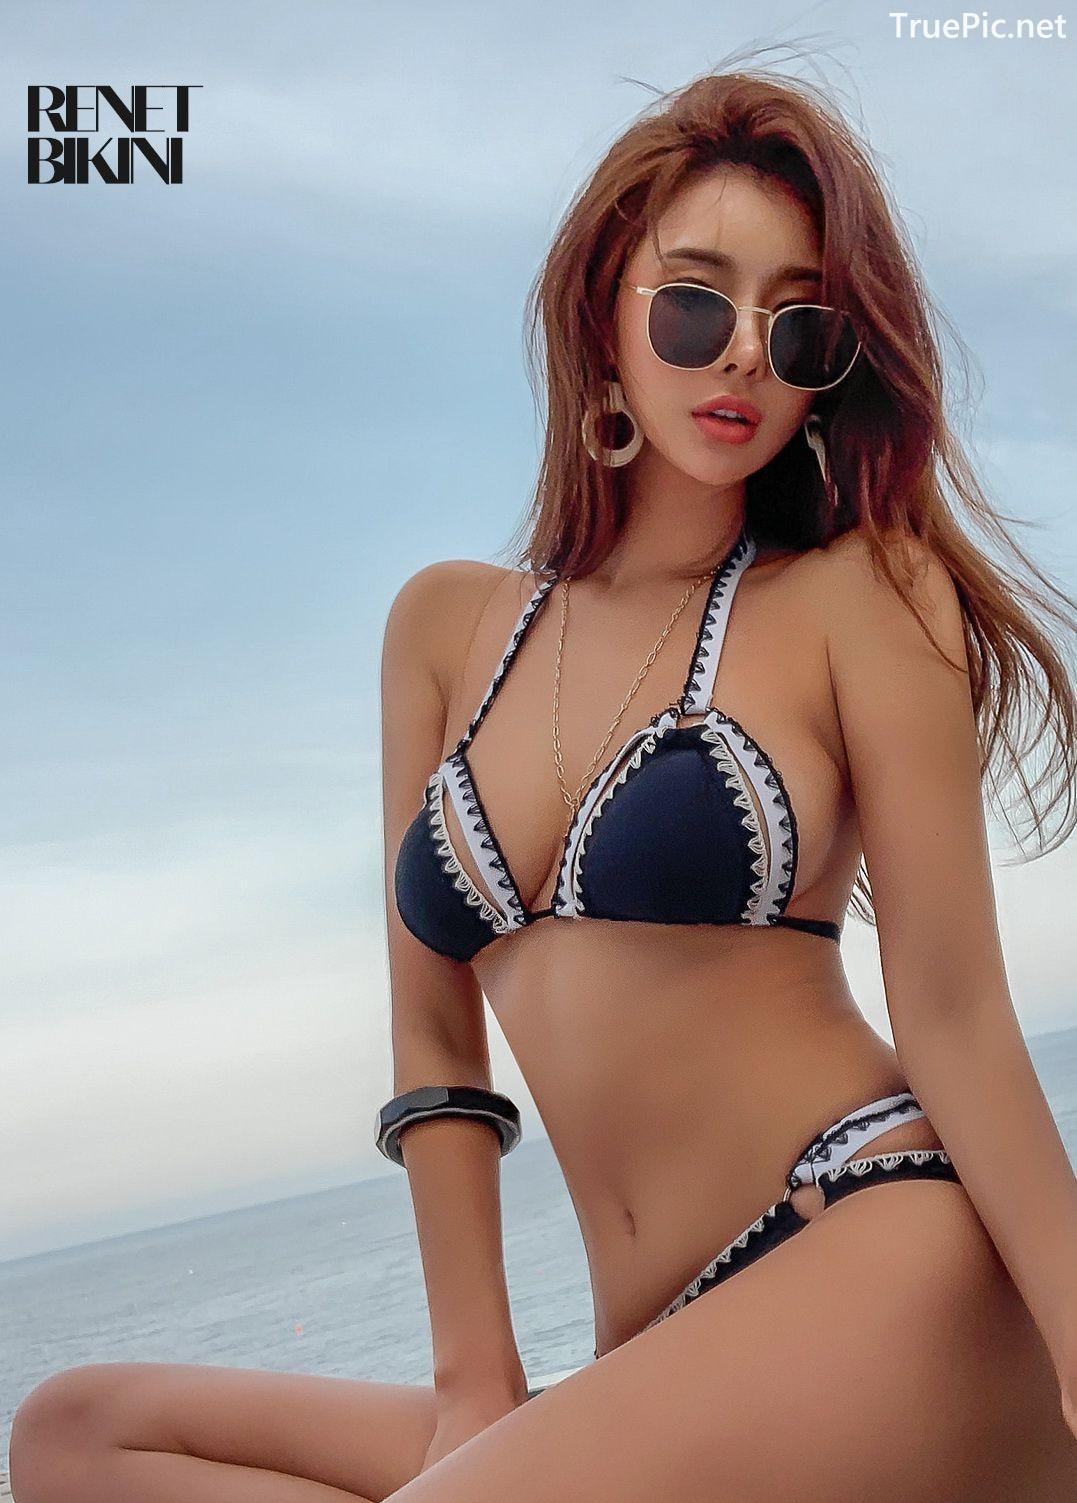 Image Korean Fashion Model - Park Da Hyun - Renet Bikini - TruePic.net - Picture-1